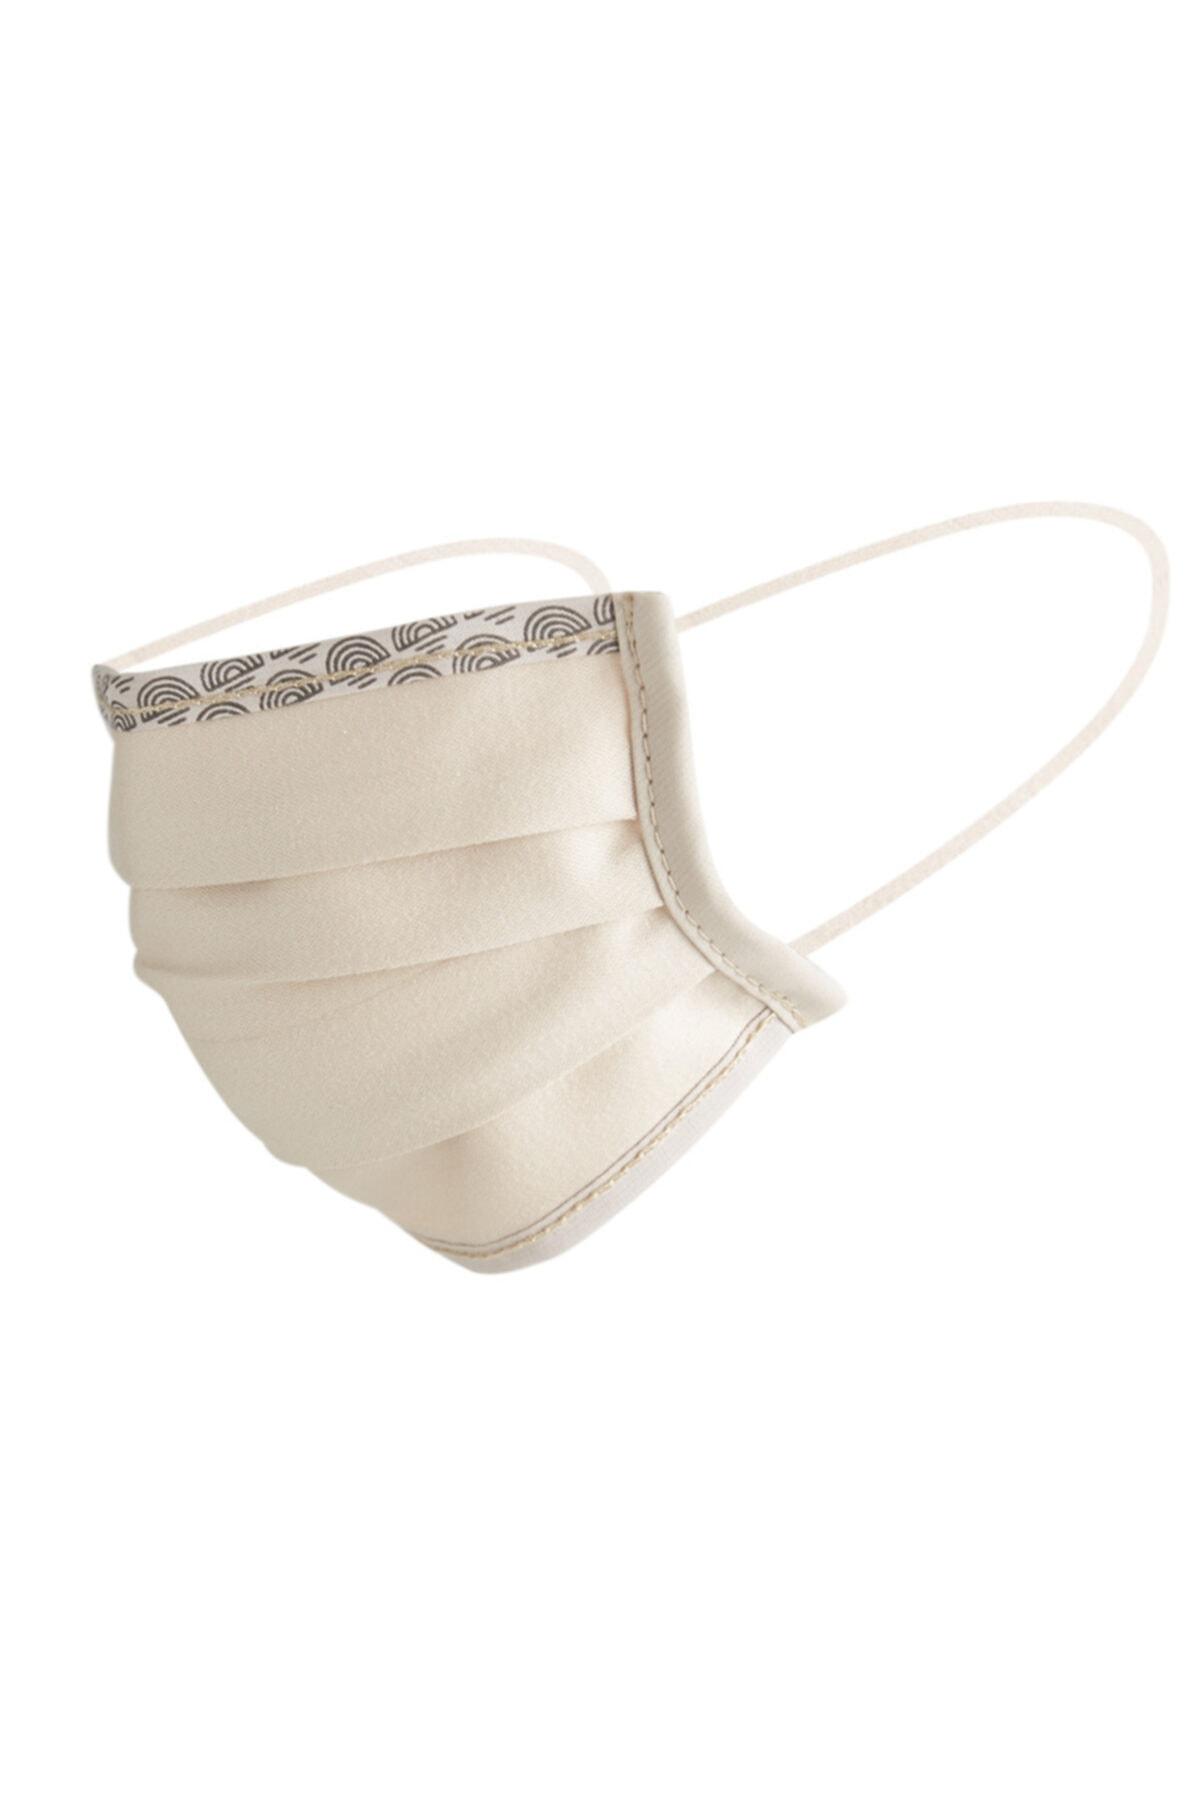 Maisonette Bej Yıkanabilir Pamuklu Yüz Maskesi 5 Li Paket 1